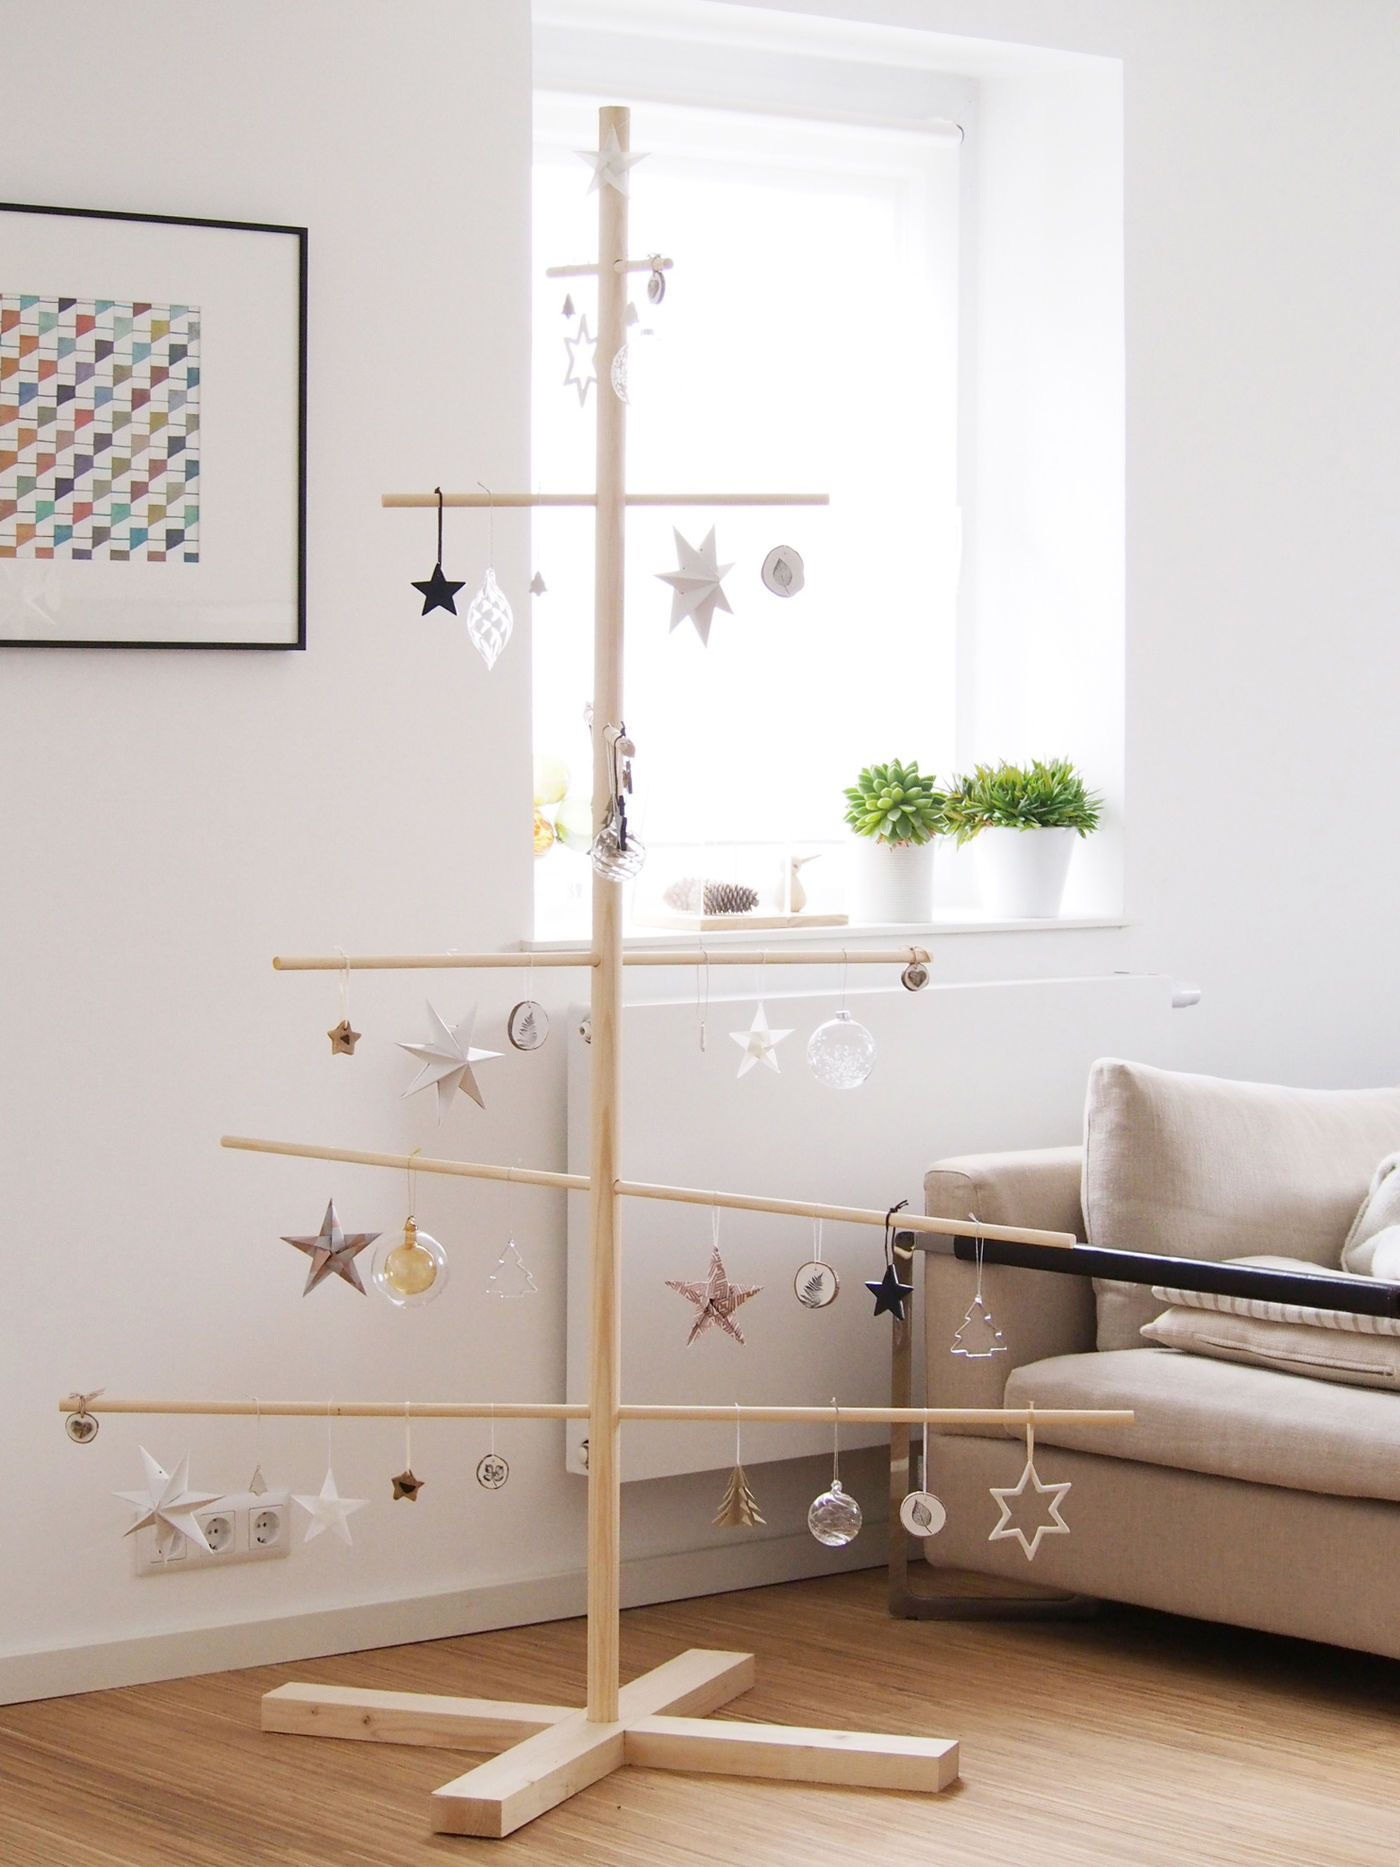 christbaumschmuck basteln ideen bilder. Black Bedroom Furniture Sets. Home Design Ideas